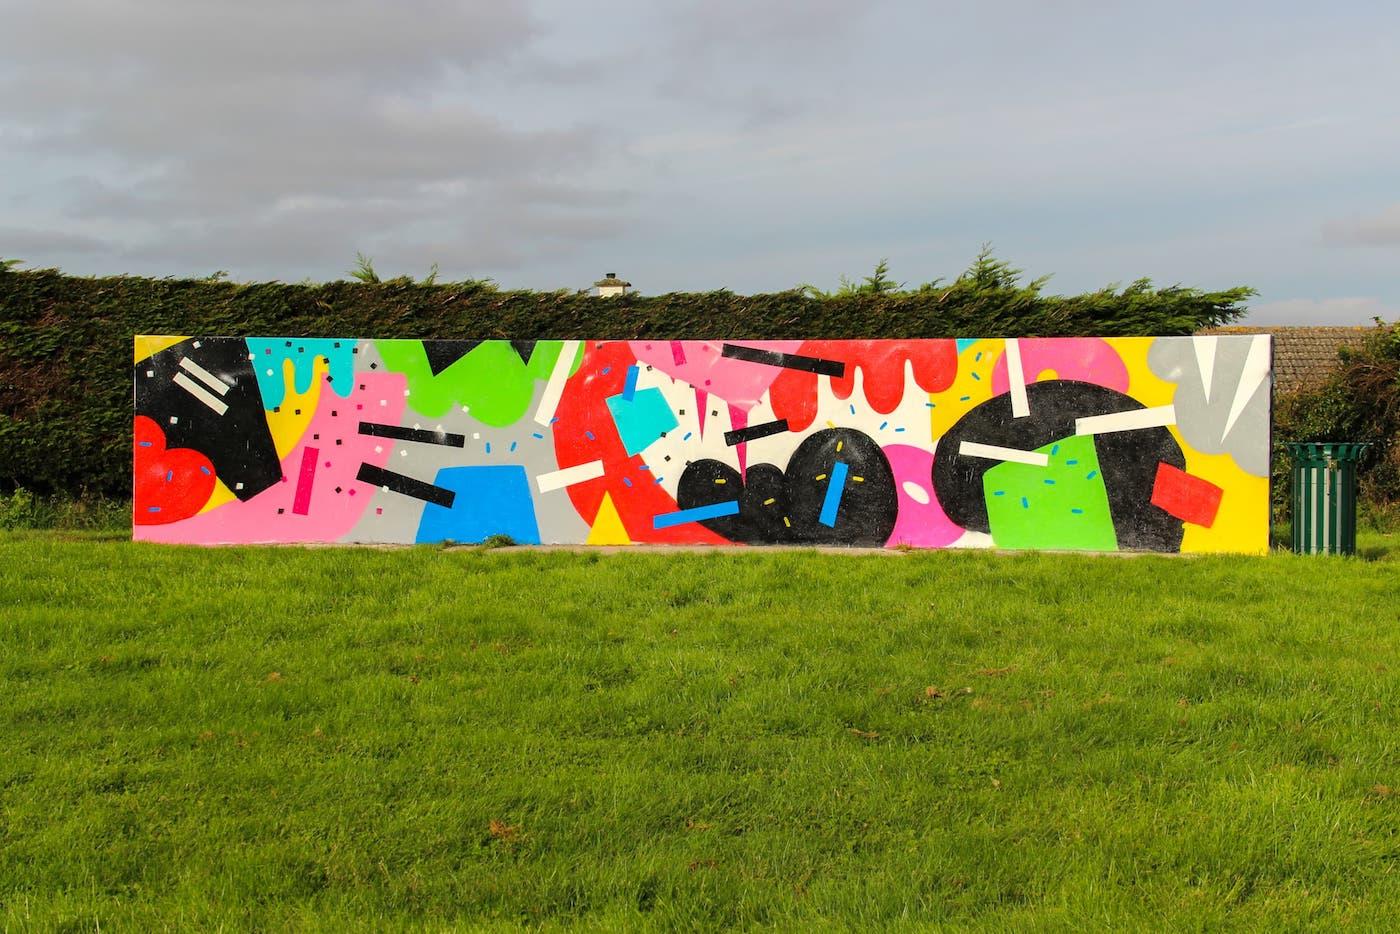 callington-cornwall-street-art-mural-b